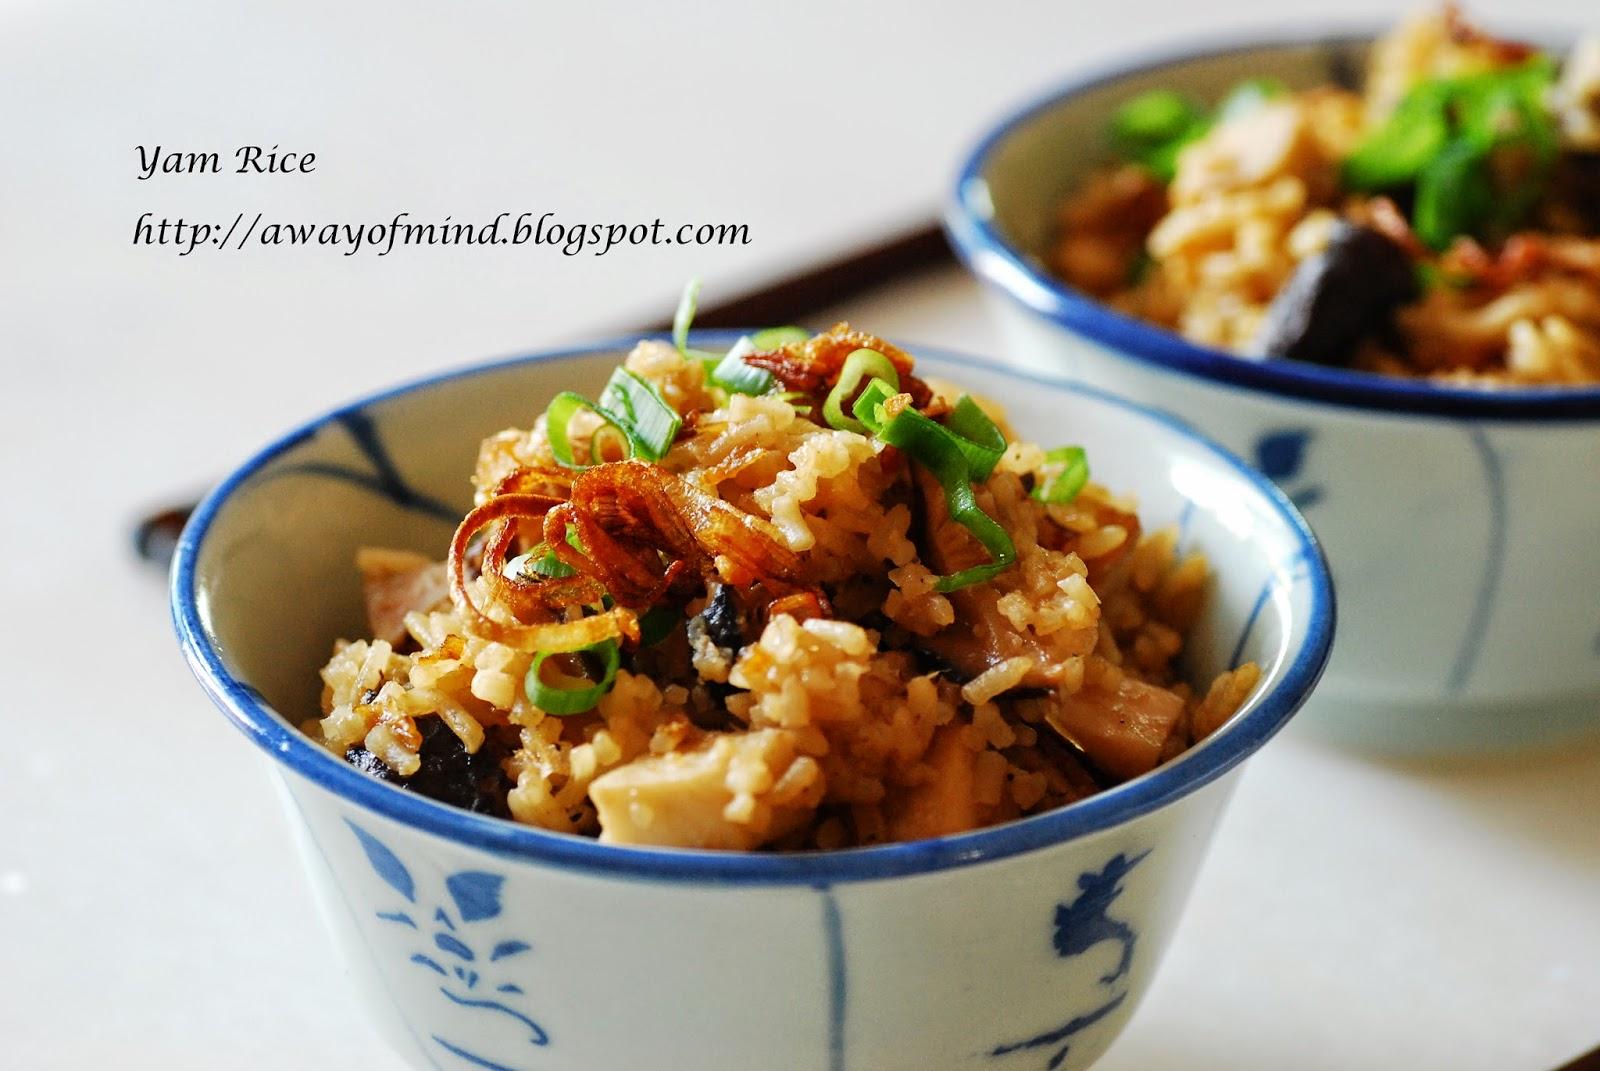 Awayofmind Bakery House: Yam Rice (Taro Rice 芋头饭)